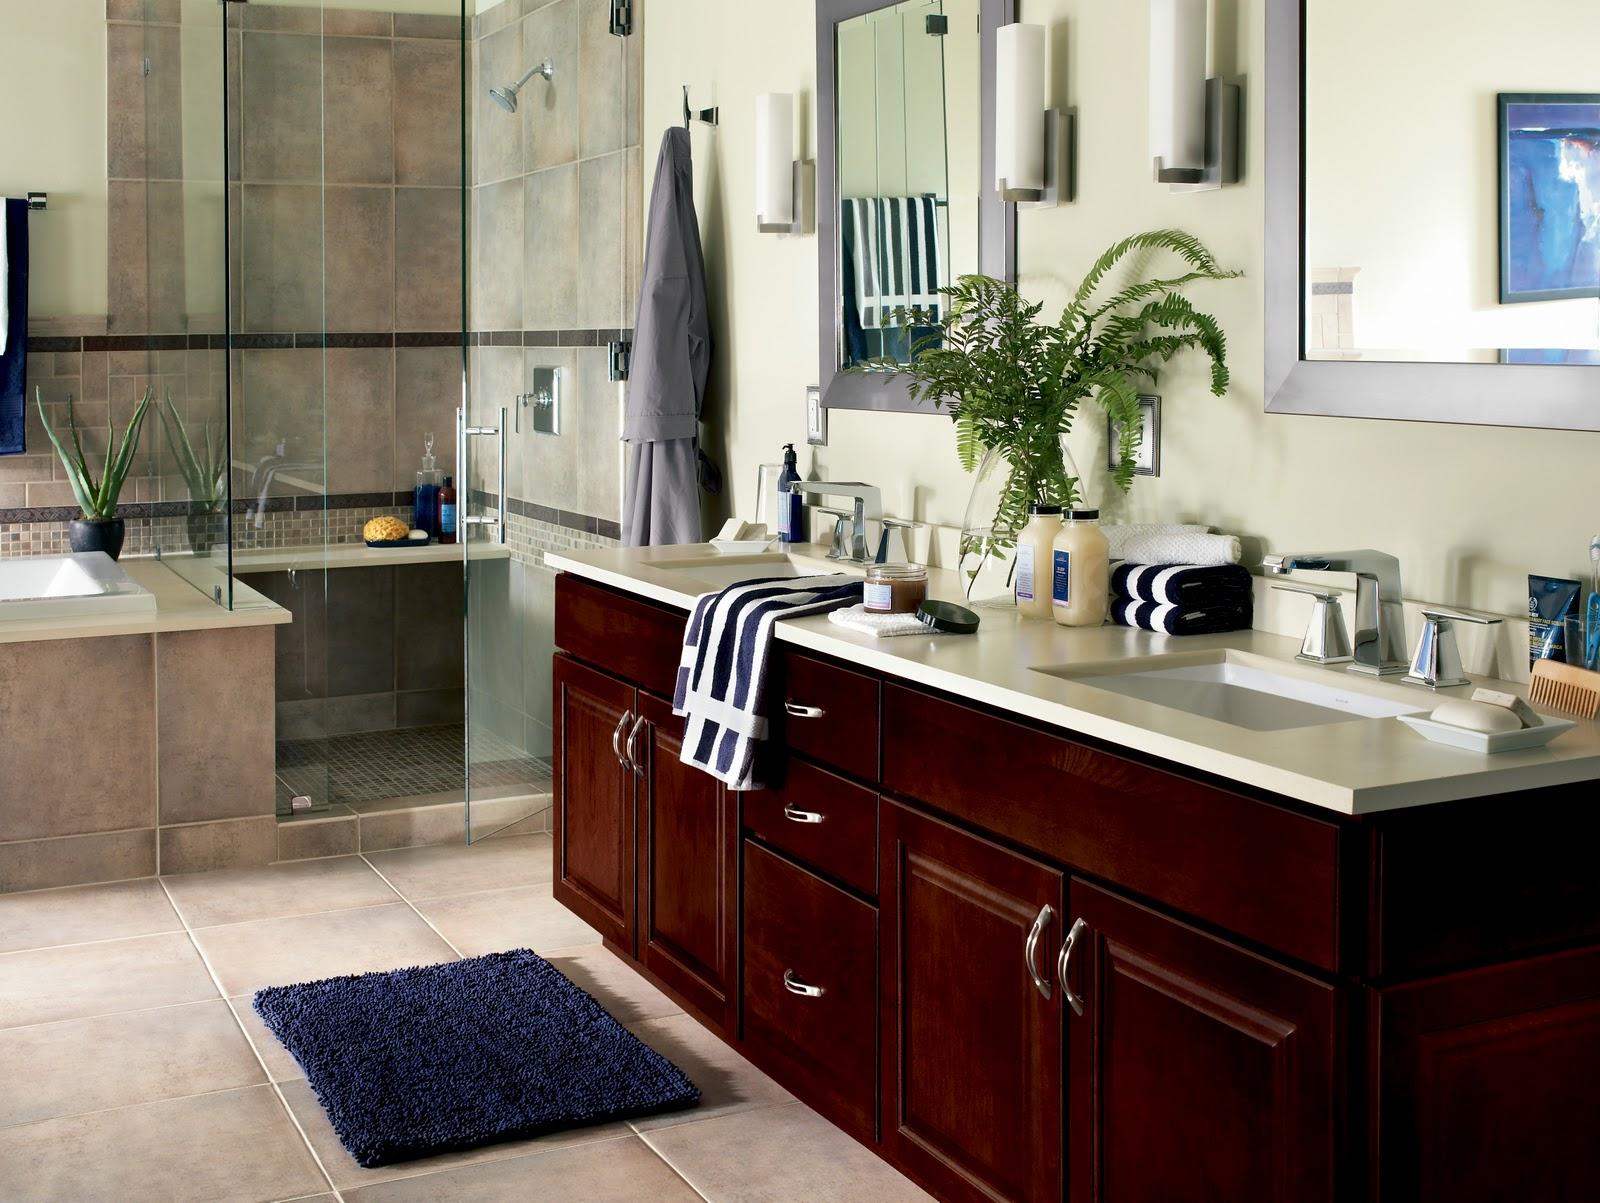 Bathroom Remodeling - Bath Remodel Contractor on Restroom Renovation  id=85915